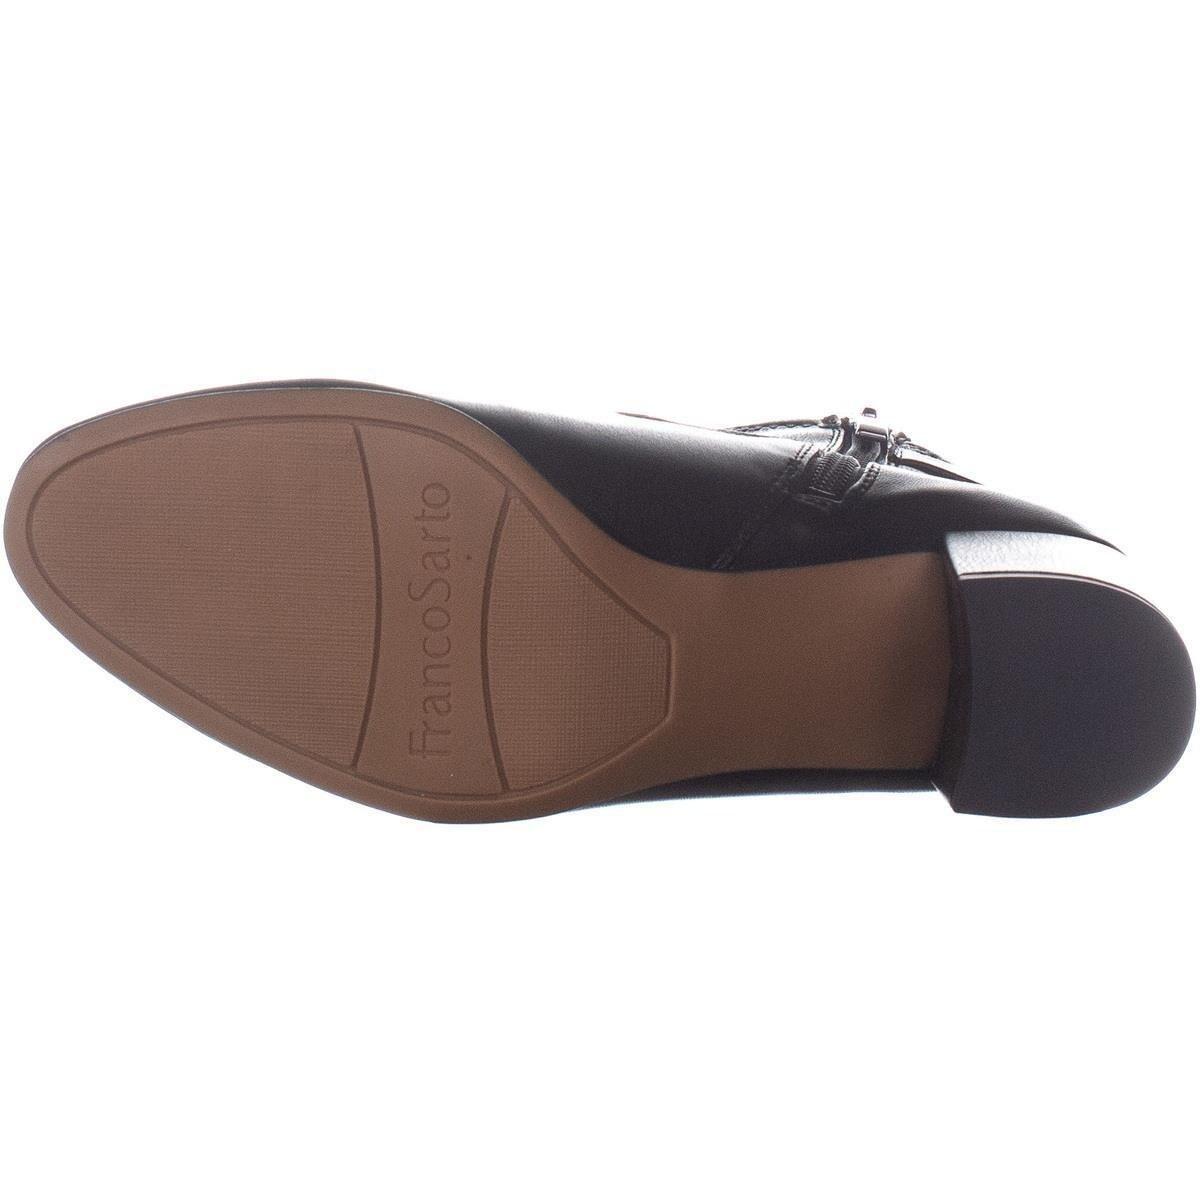 337f3fed75c Shop Franco Sarto Newton Zip Up Block Heel Boots